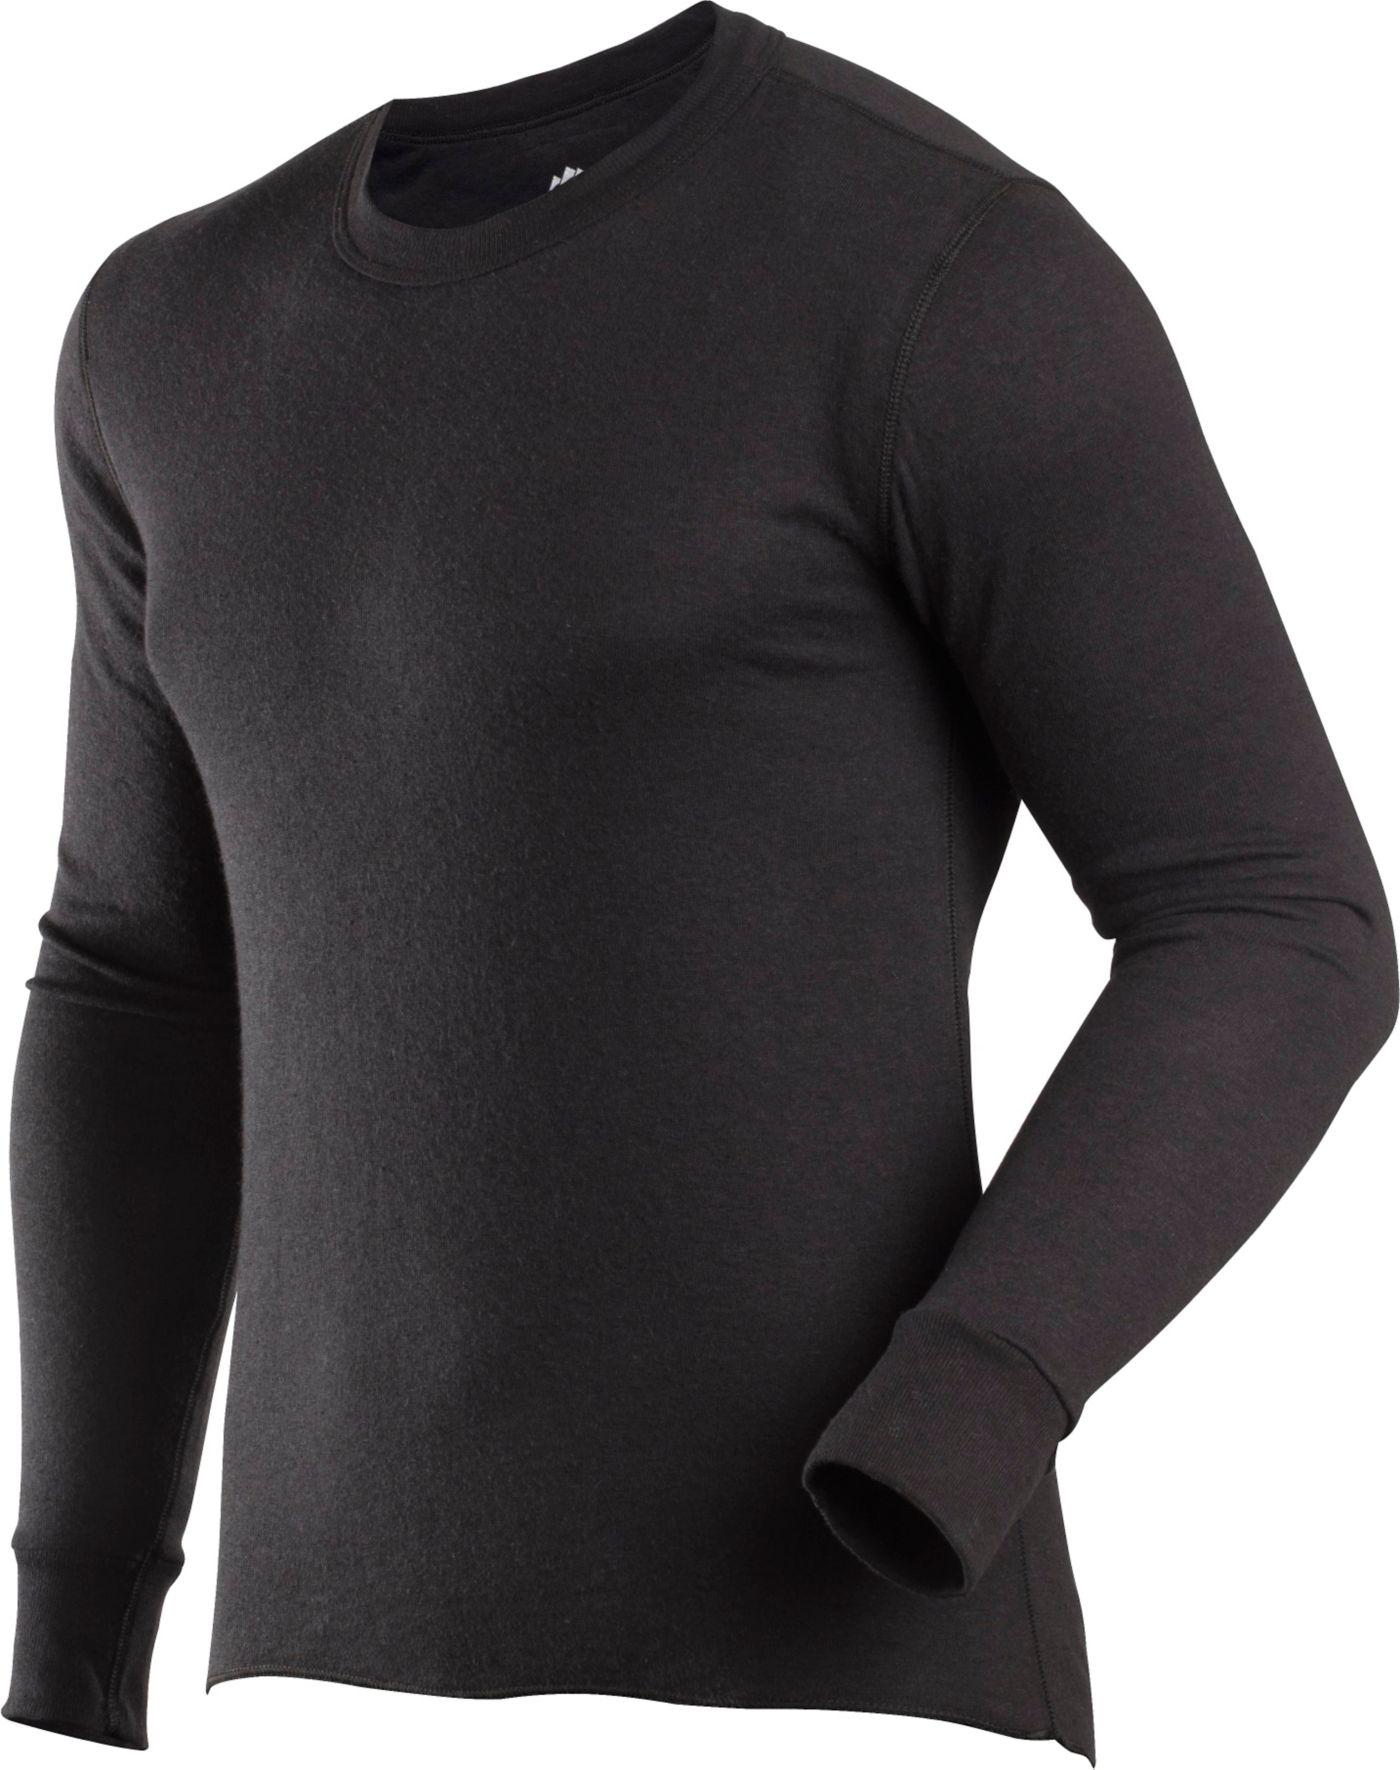 ColdPruf Men's Basic Crew Base Layer Long Sleeve Shirt (Regular and Big & Tall)